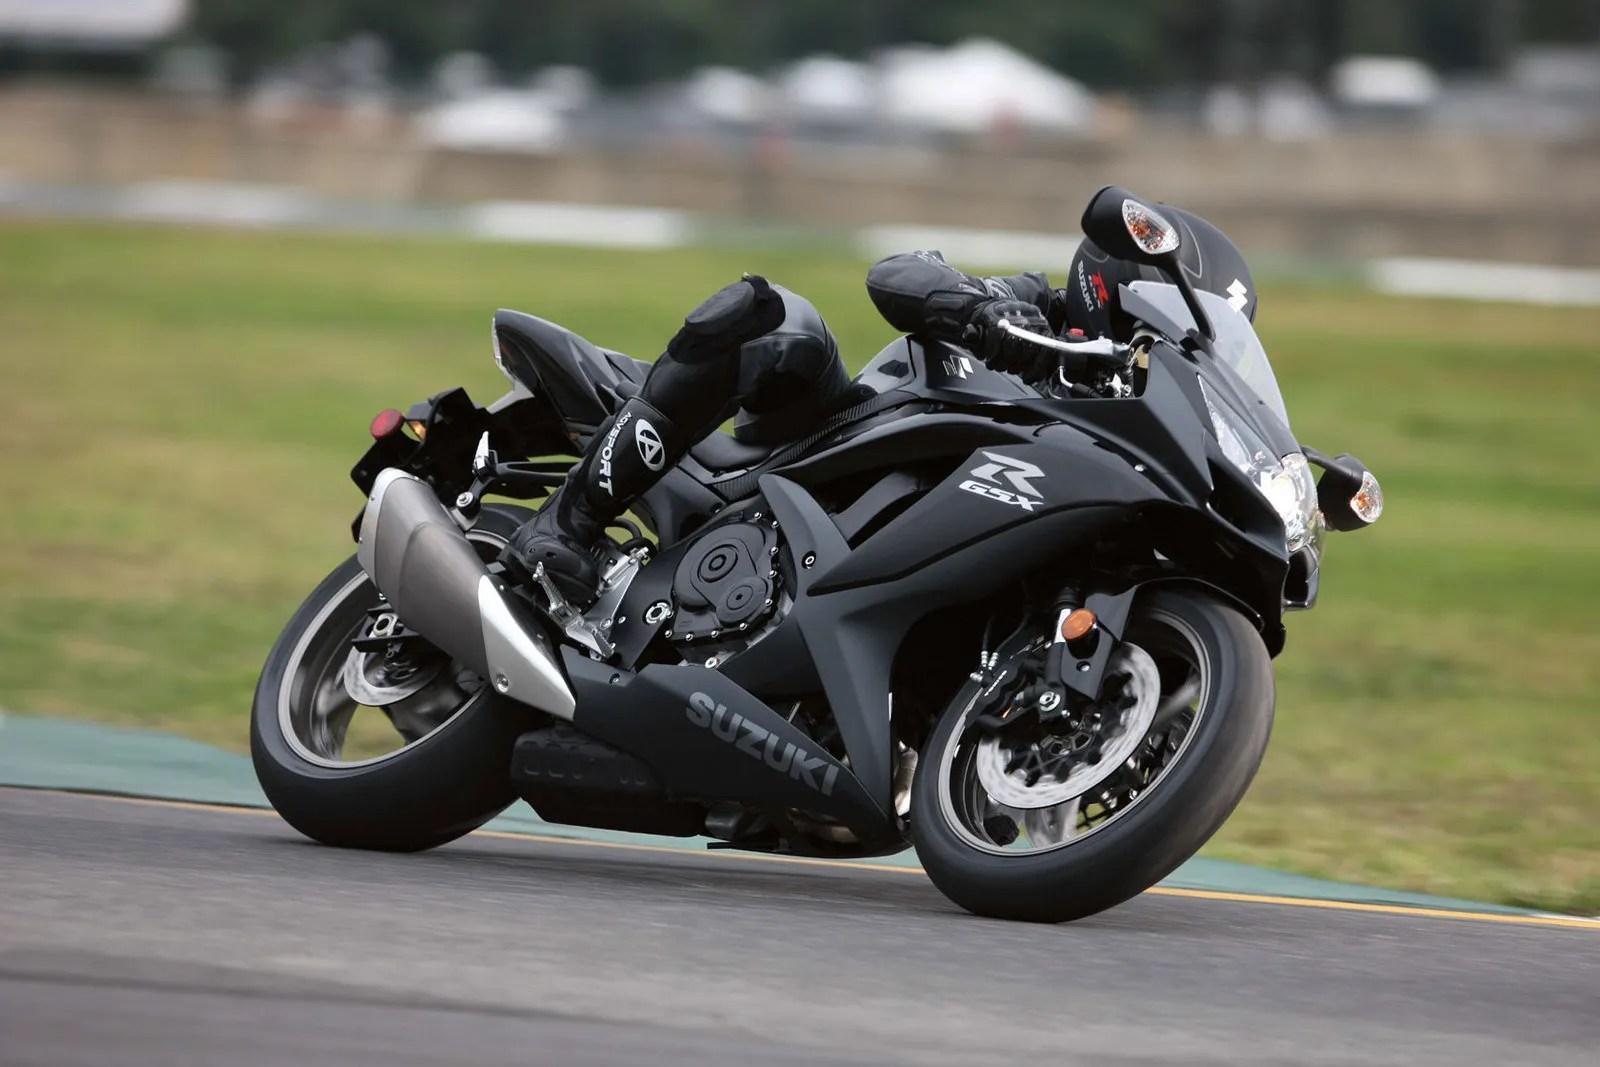 3d Yamaha Motorcycle Wallpaper 2012 Suzuki Gsx R750 Top Speed